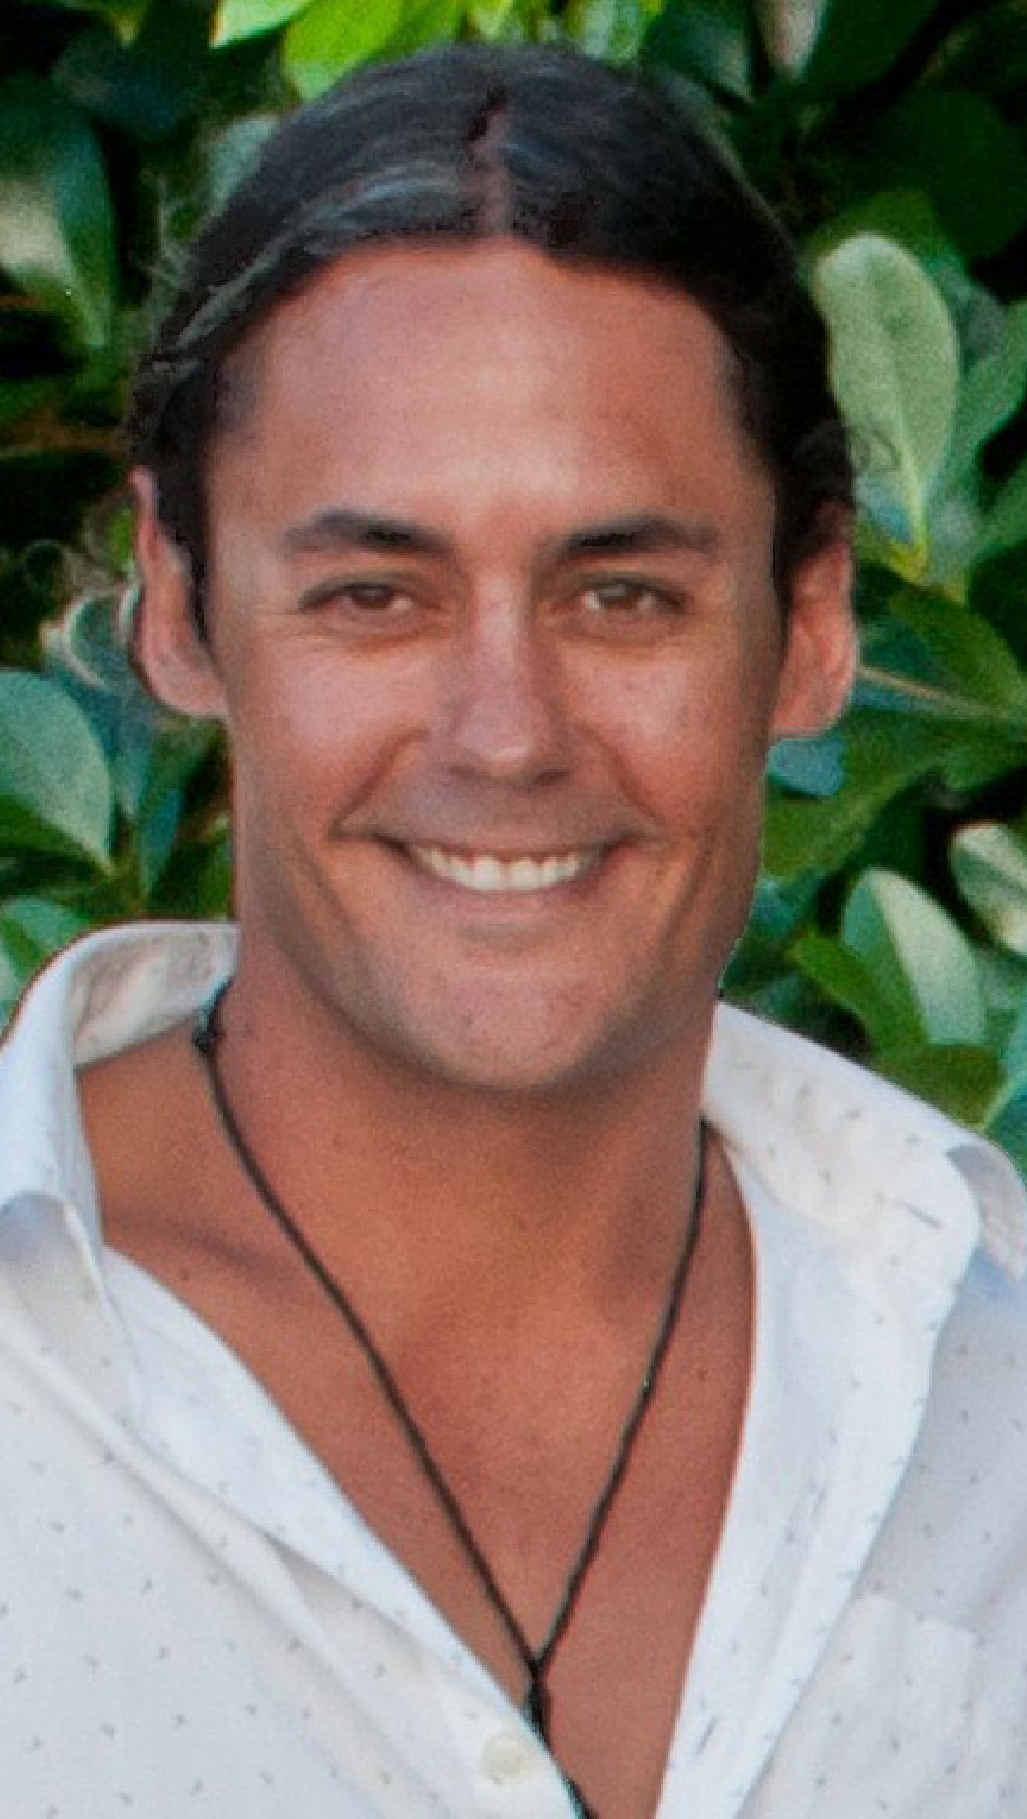 Matthew Shrimpton has been missing at sea since Saturday night.